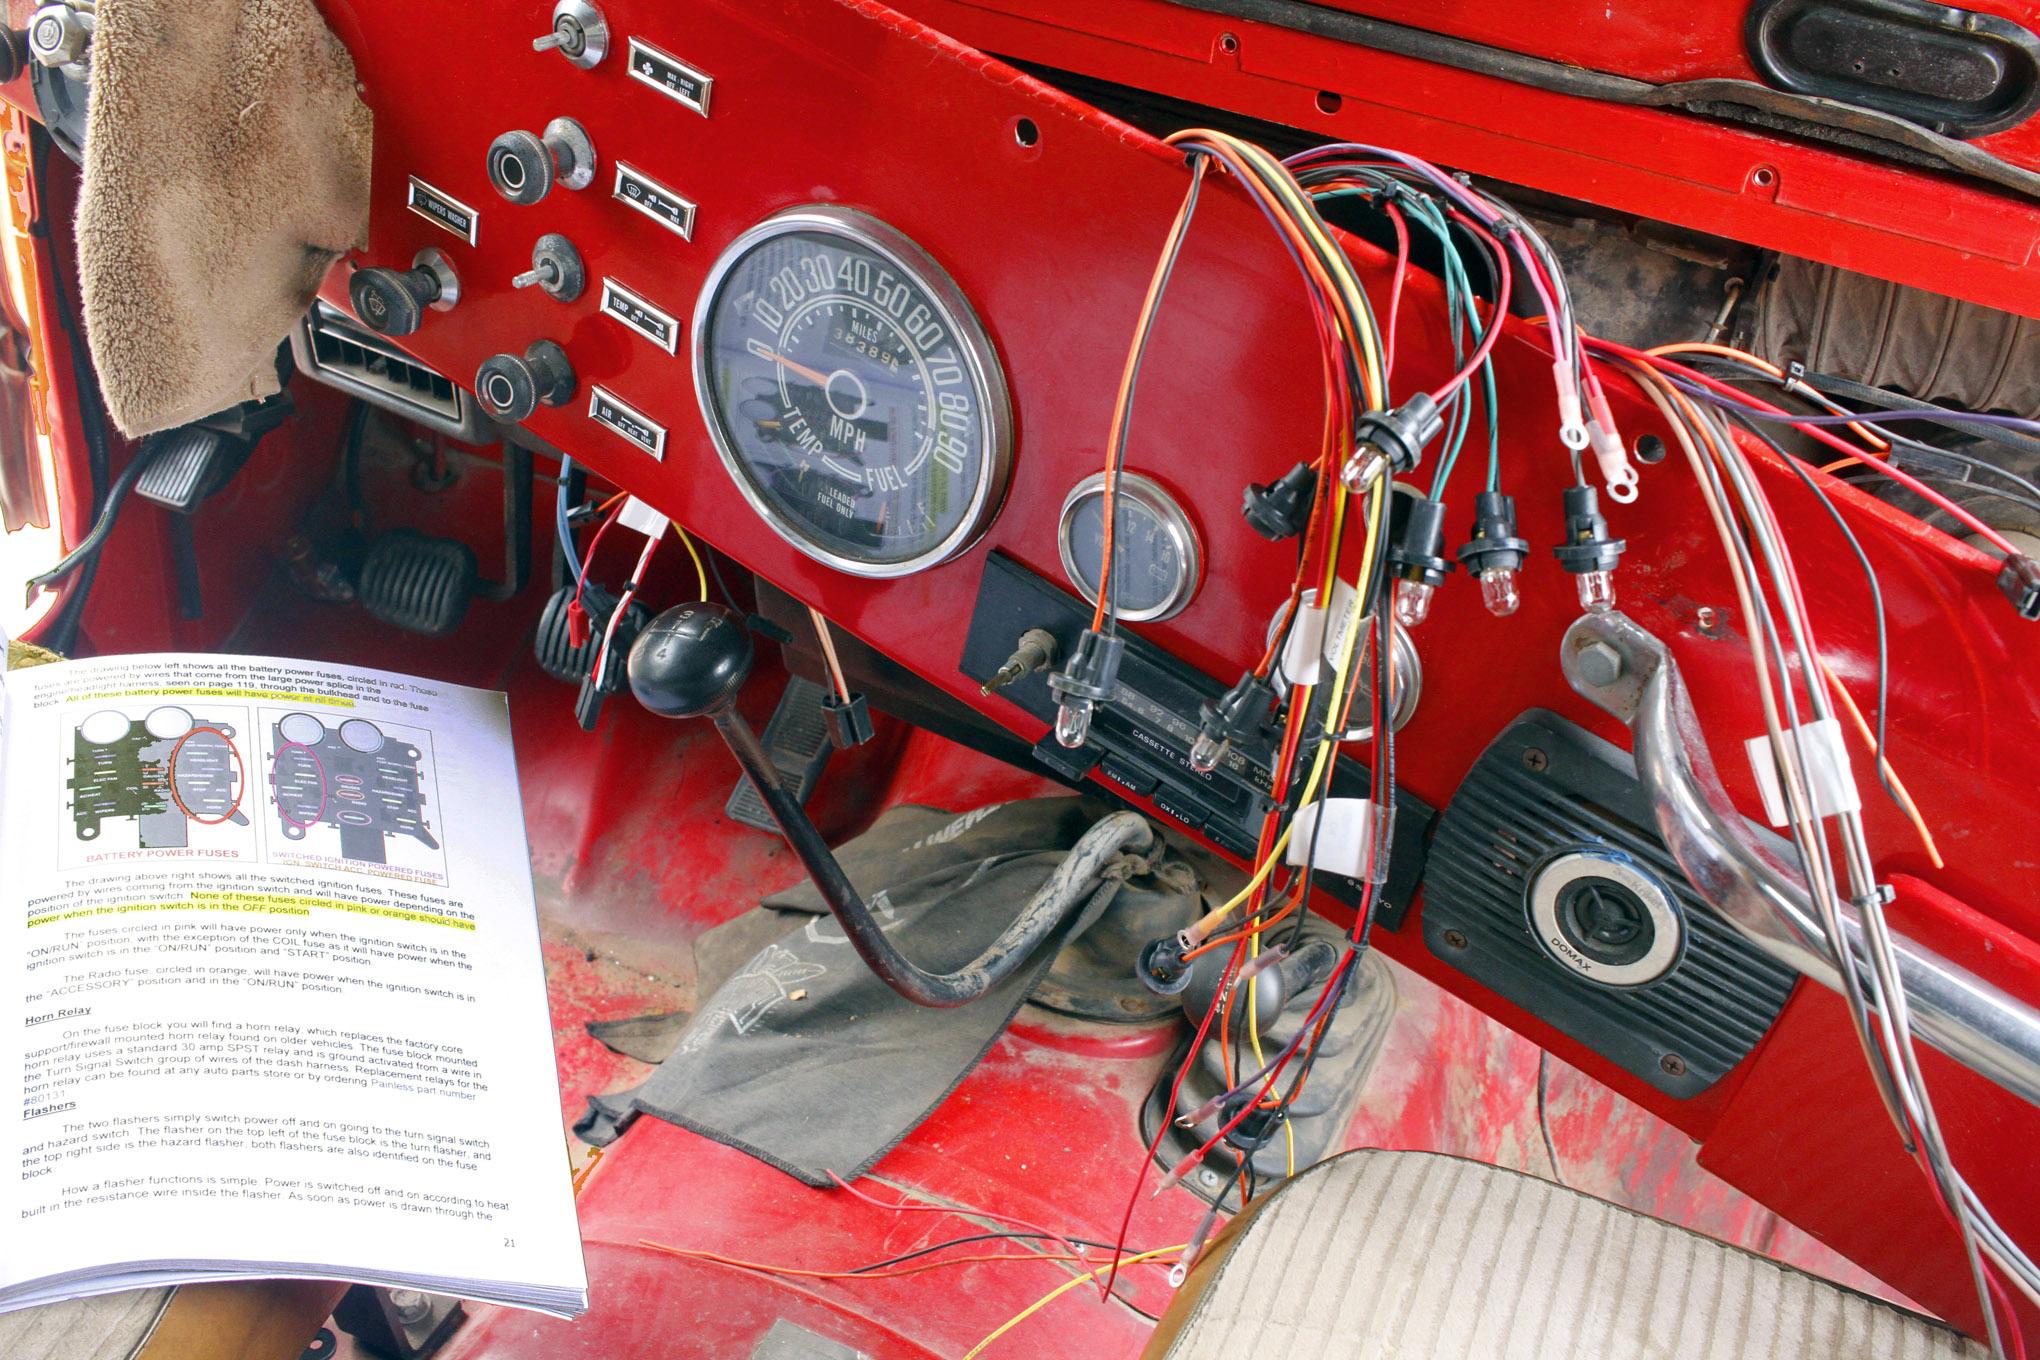 1986 Cj7 Engine Wiring - daily update wiring diagram  Cj Jeep Wiring Diagram on 1973 vw karmann ghia wiring-diagram, 1980 cj wiring-diagram, motorola alt wiring-diagram, holley carb choke wiring-diagram, jeep cj7 wiring-diagram,